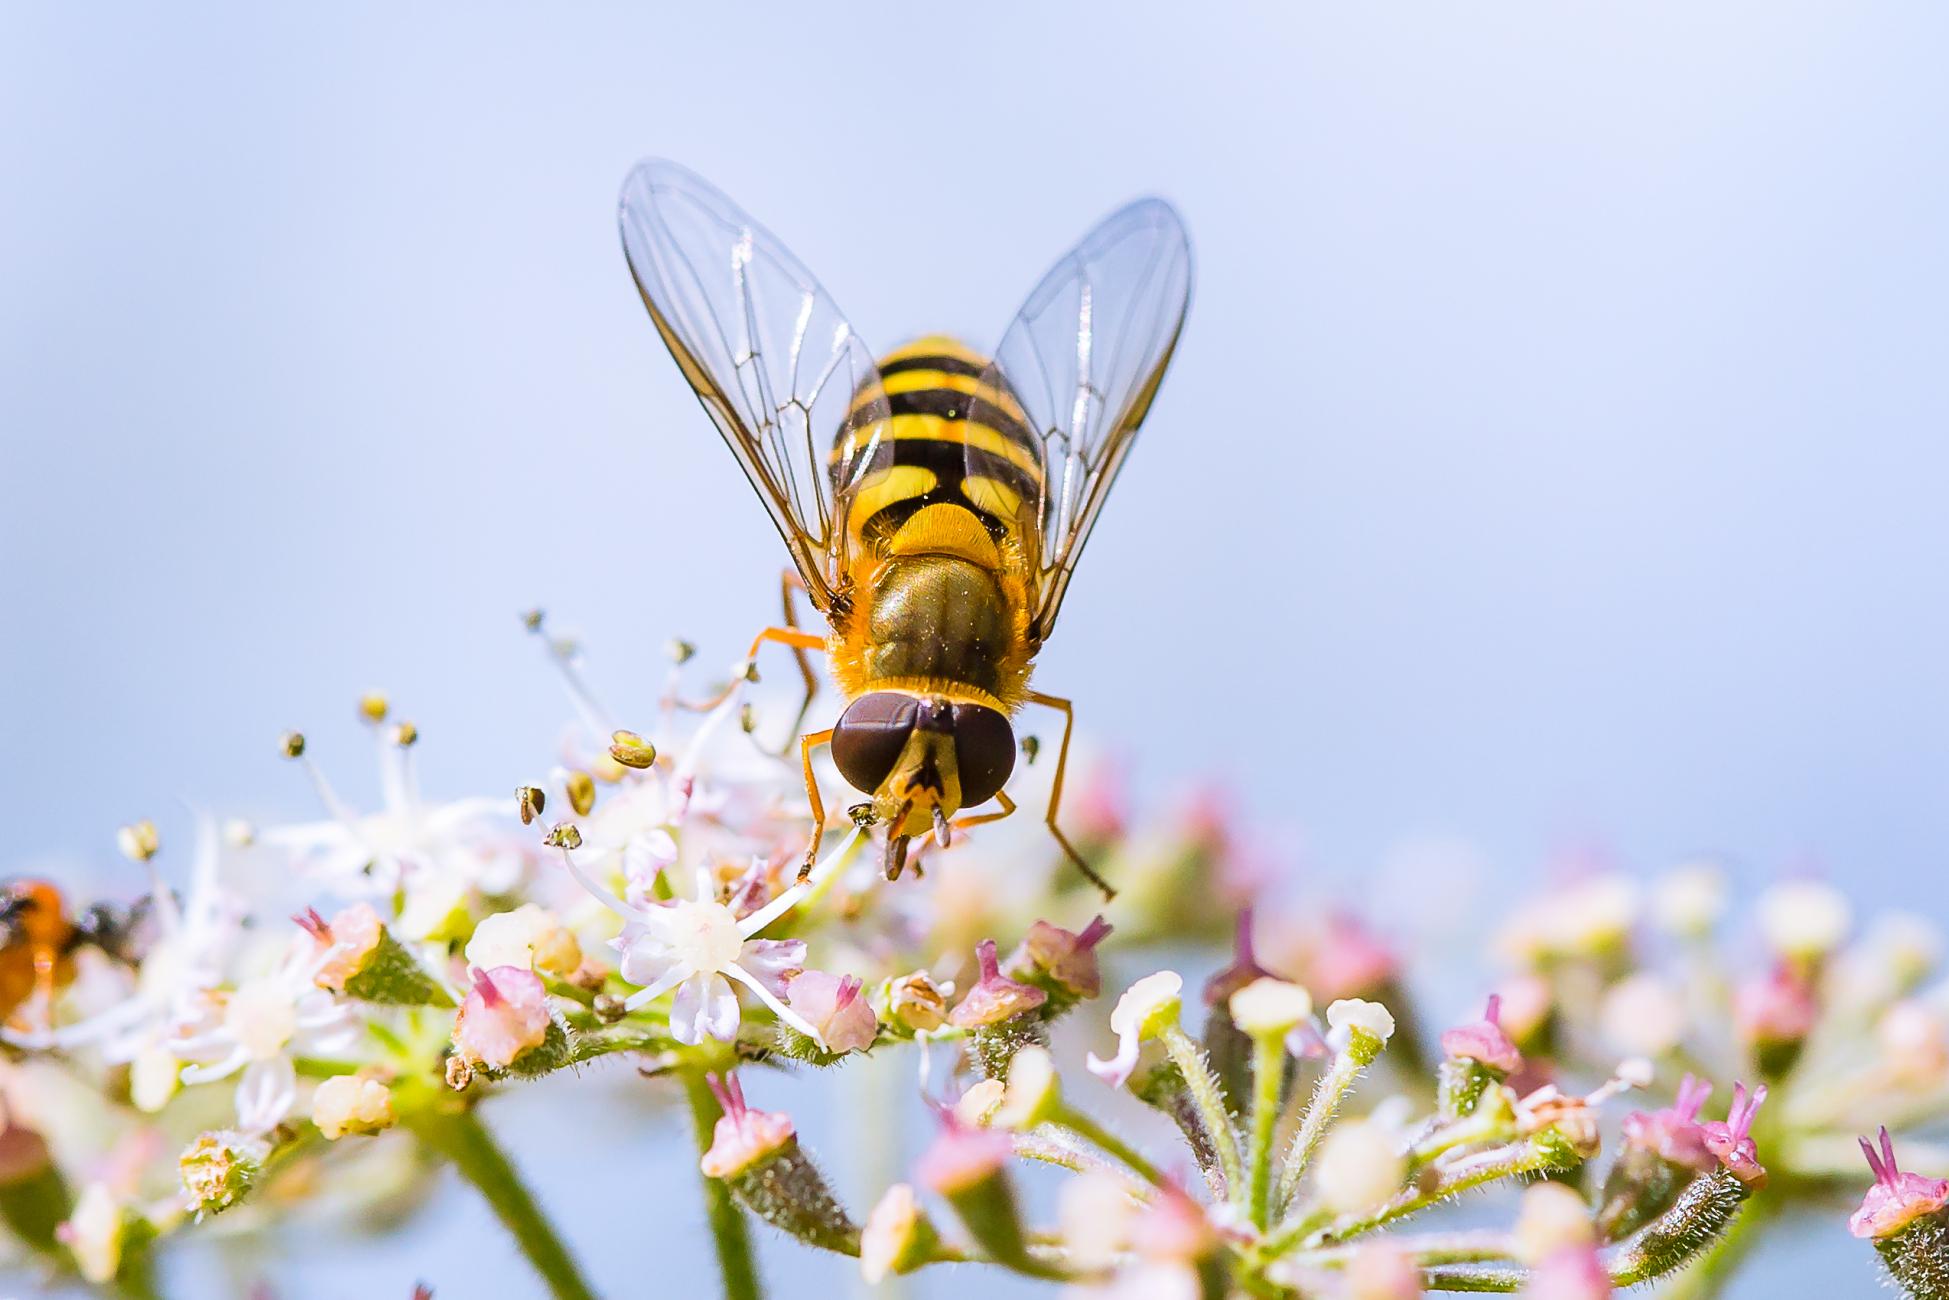 Hoverfly feeding on nectar